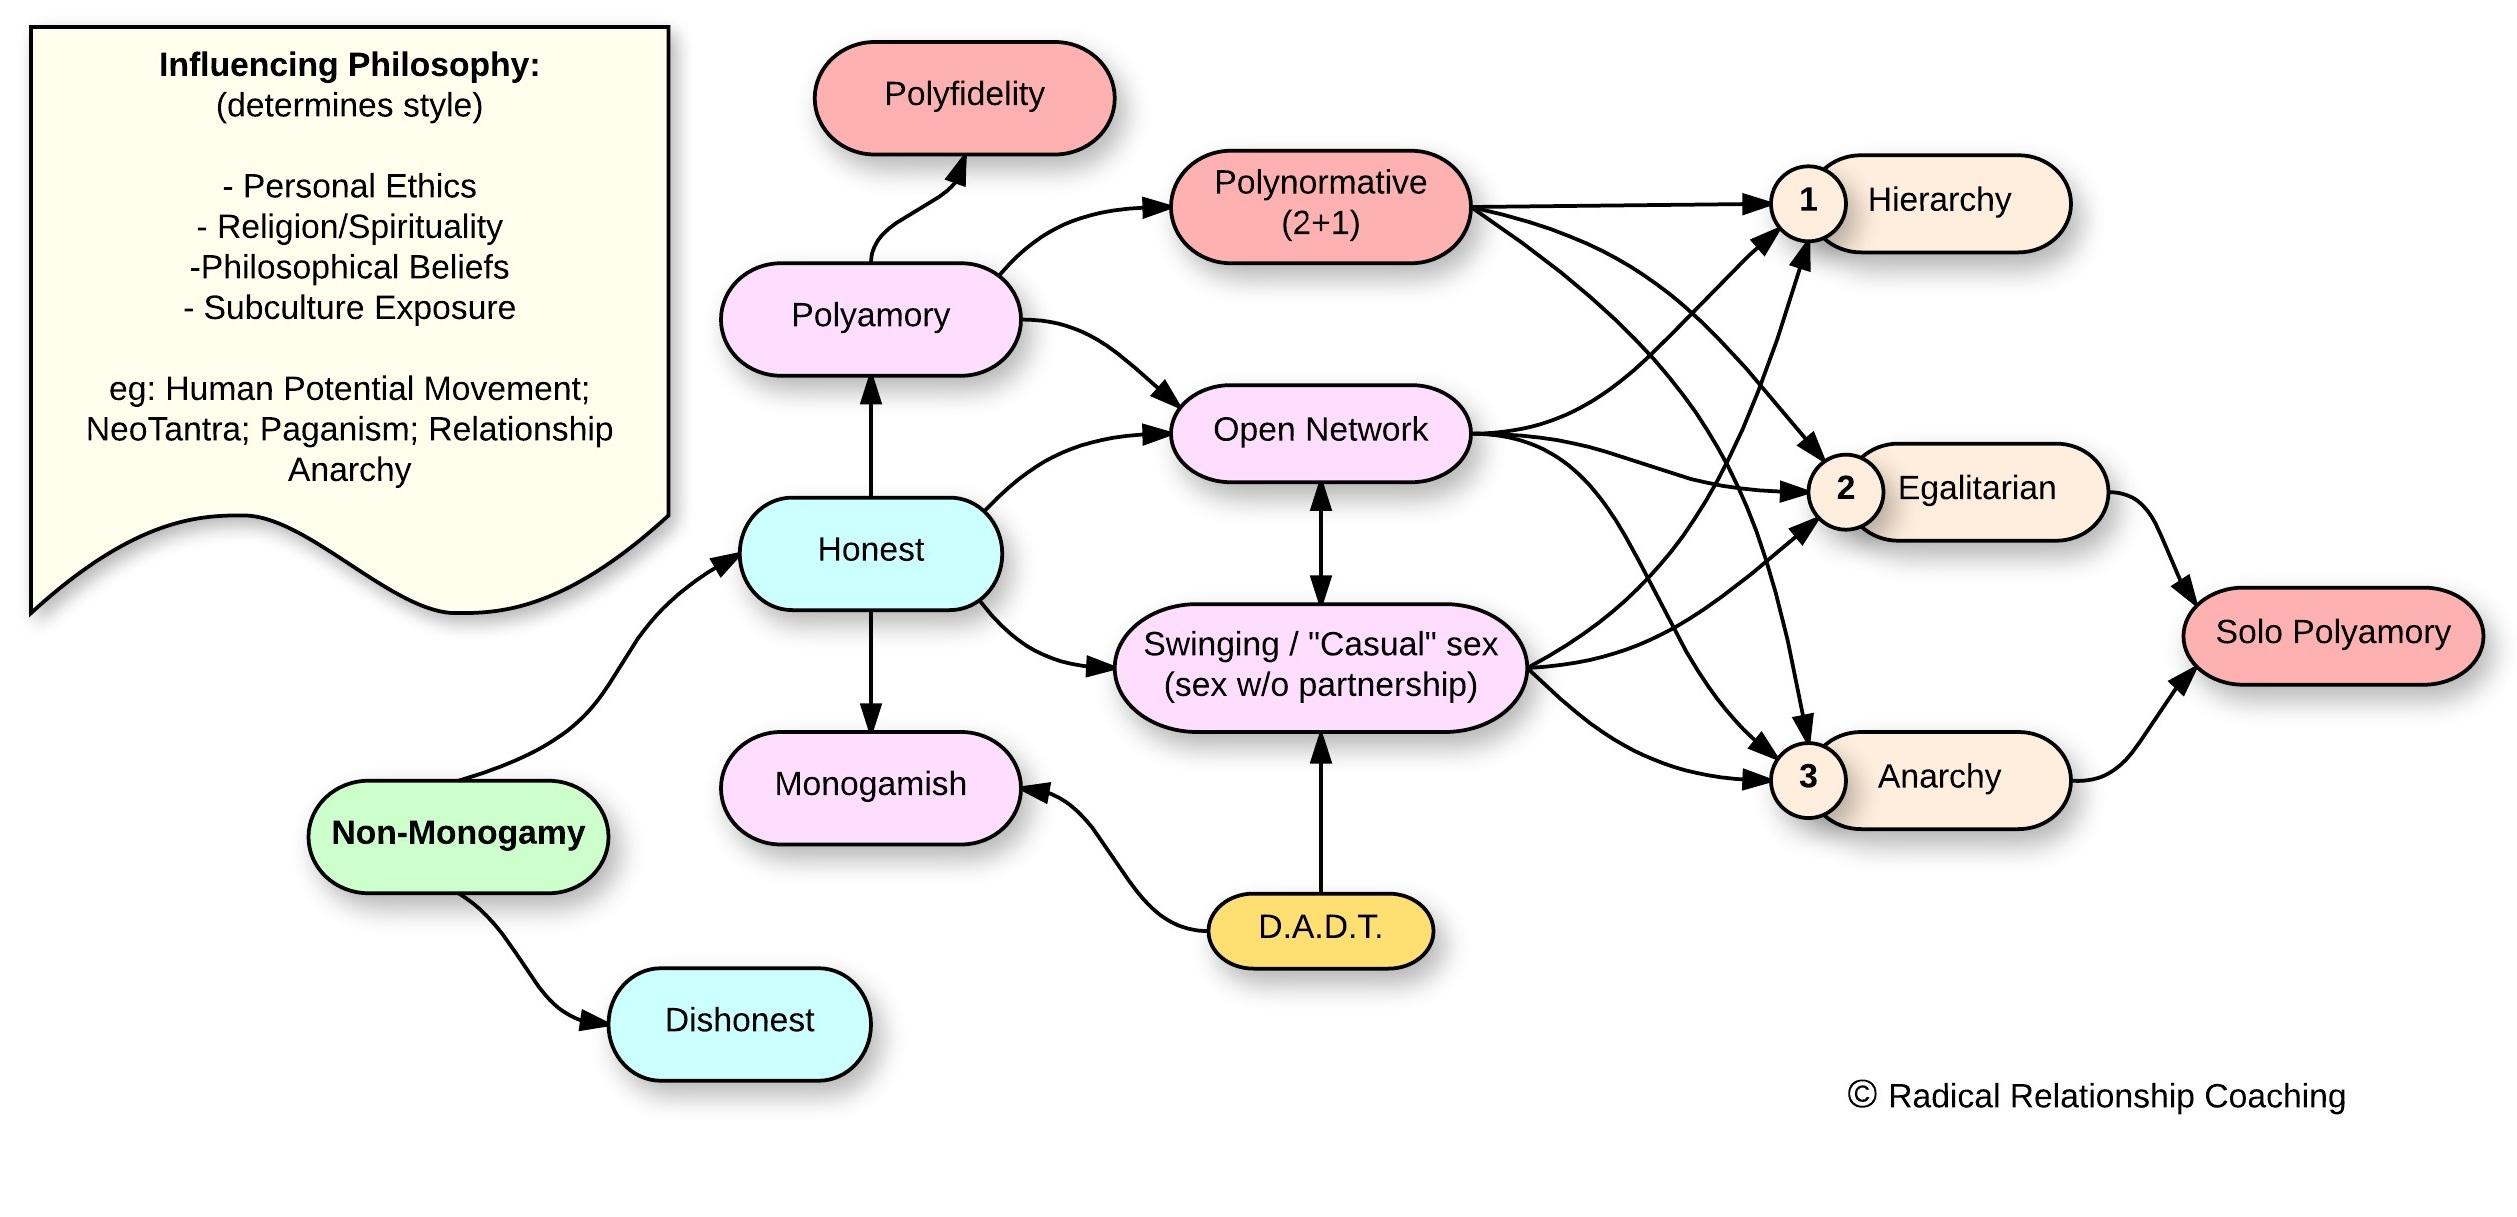 Non-monogamy diagram - Page 1 (1)